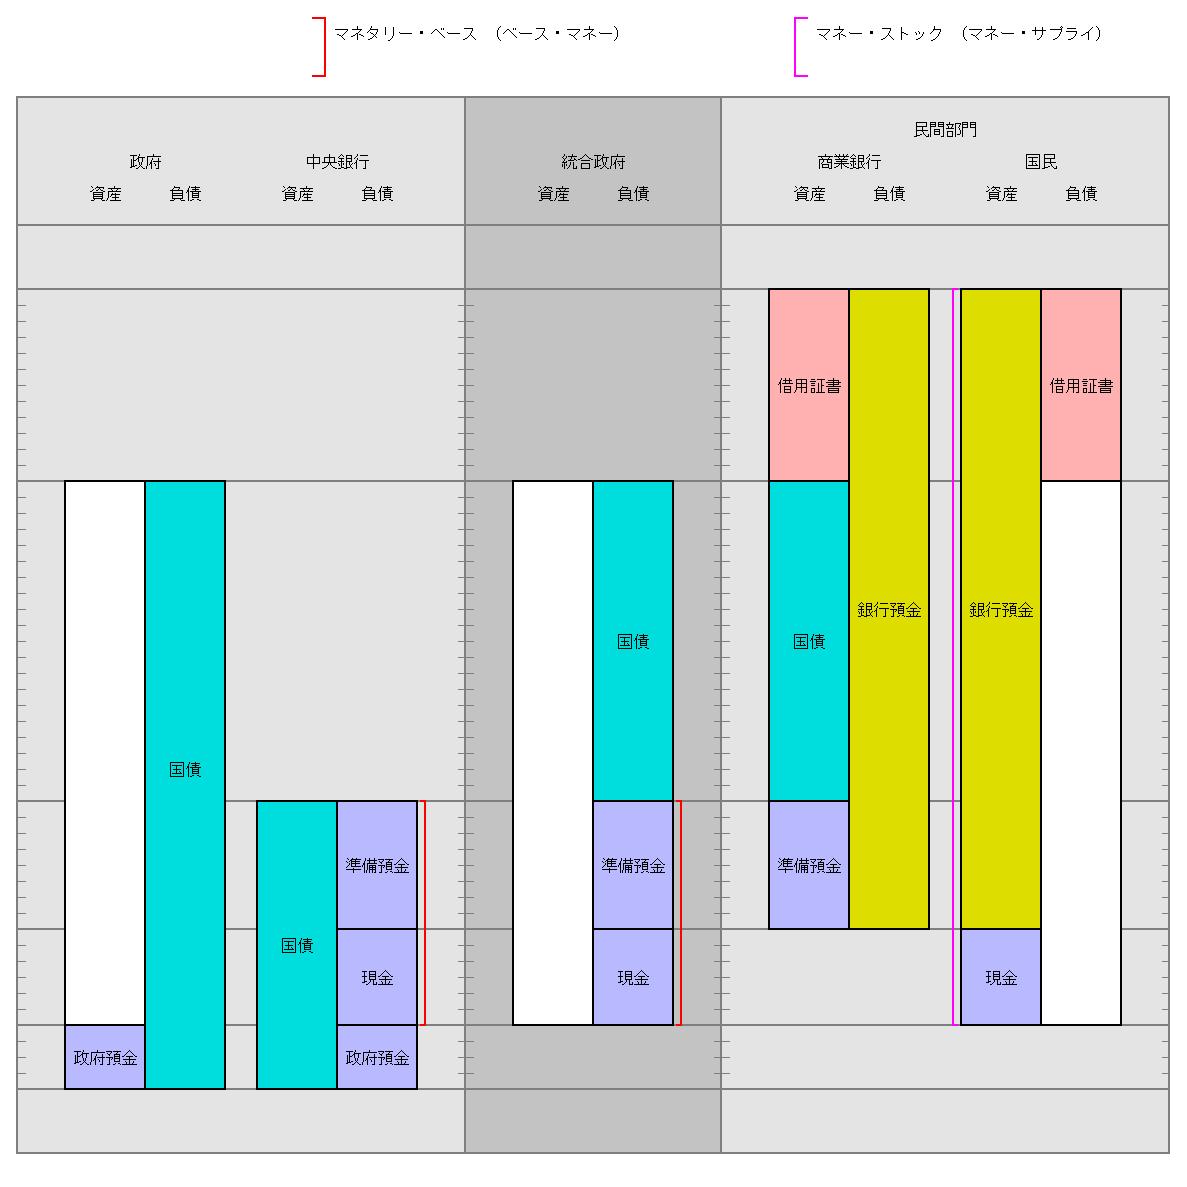 f:id:otauwohikki:20200725185002p:plain